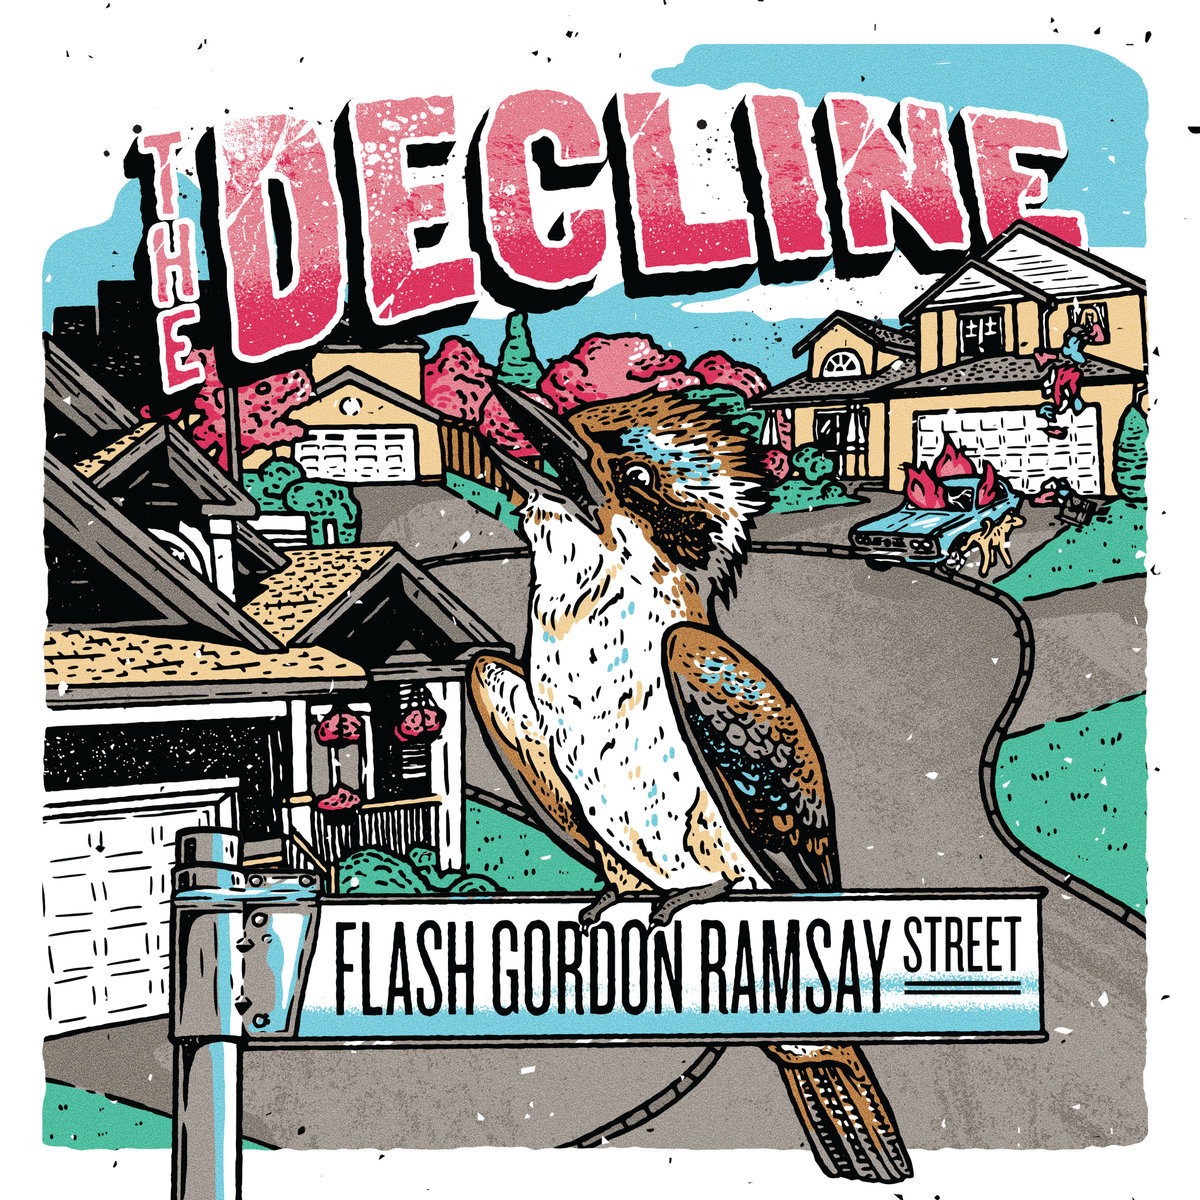 Screaming Fastcore ::: The Decline - Flash Gordon Ramsay